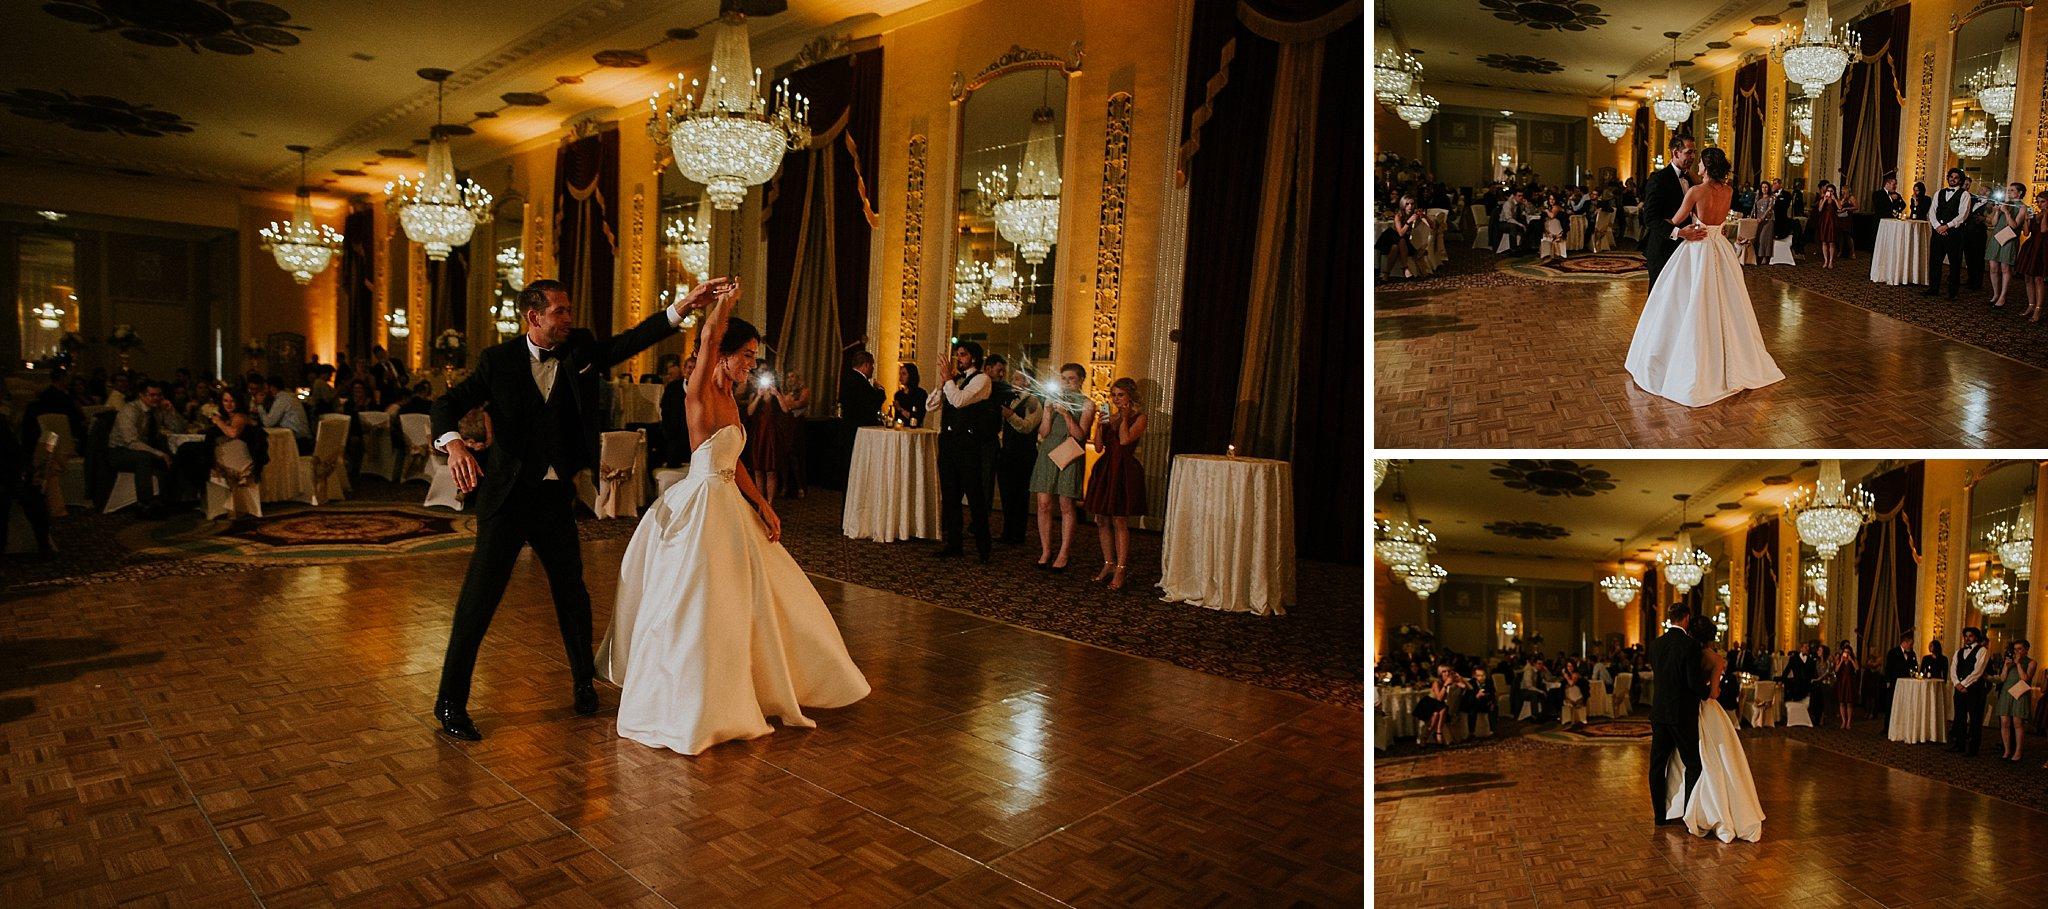 Matt-Lauren_St-Marys_Hilton-City-Center-Milwaukee-Wedding_liller-photo_0084.jpg